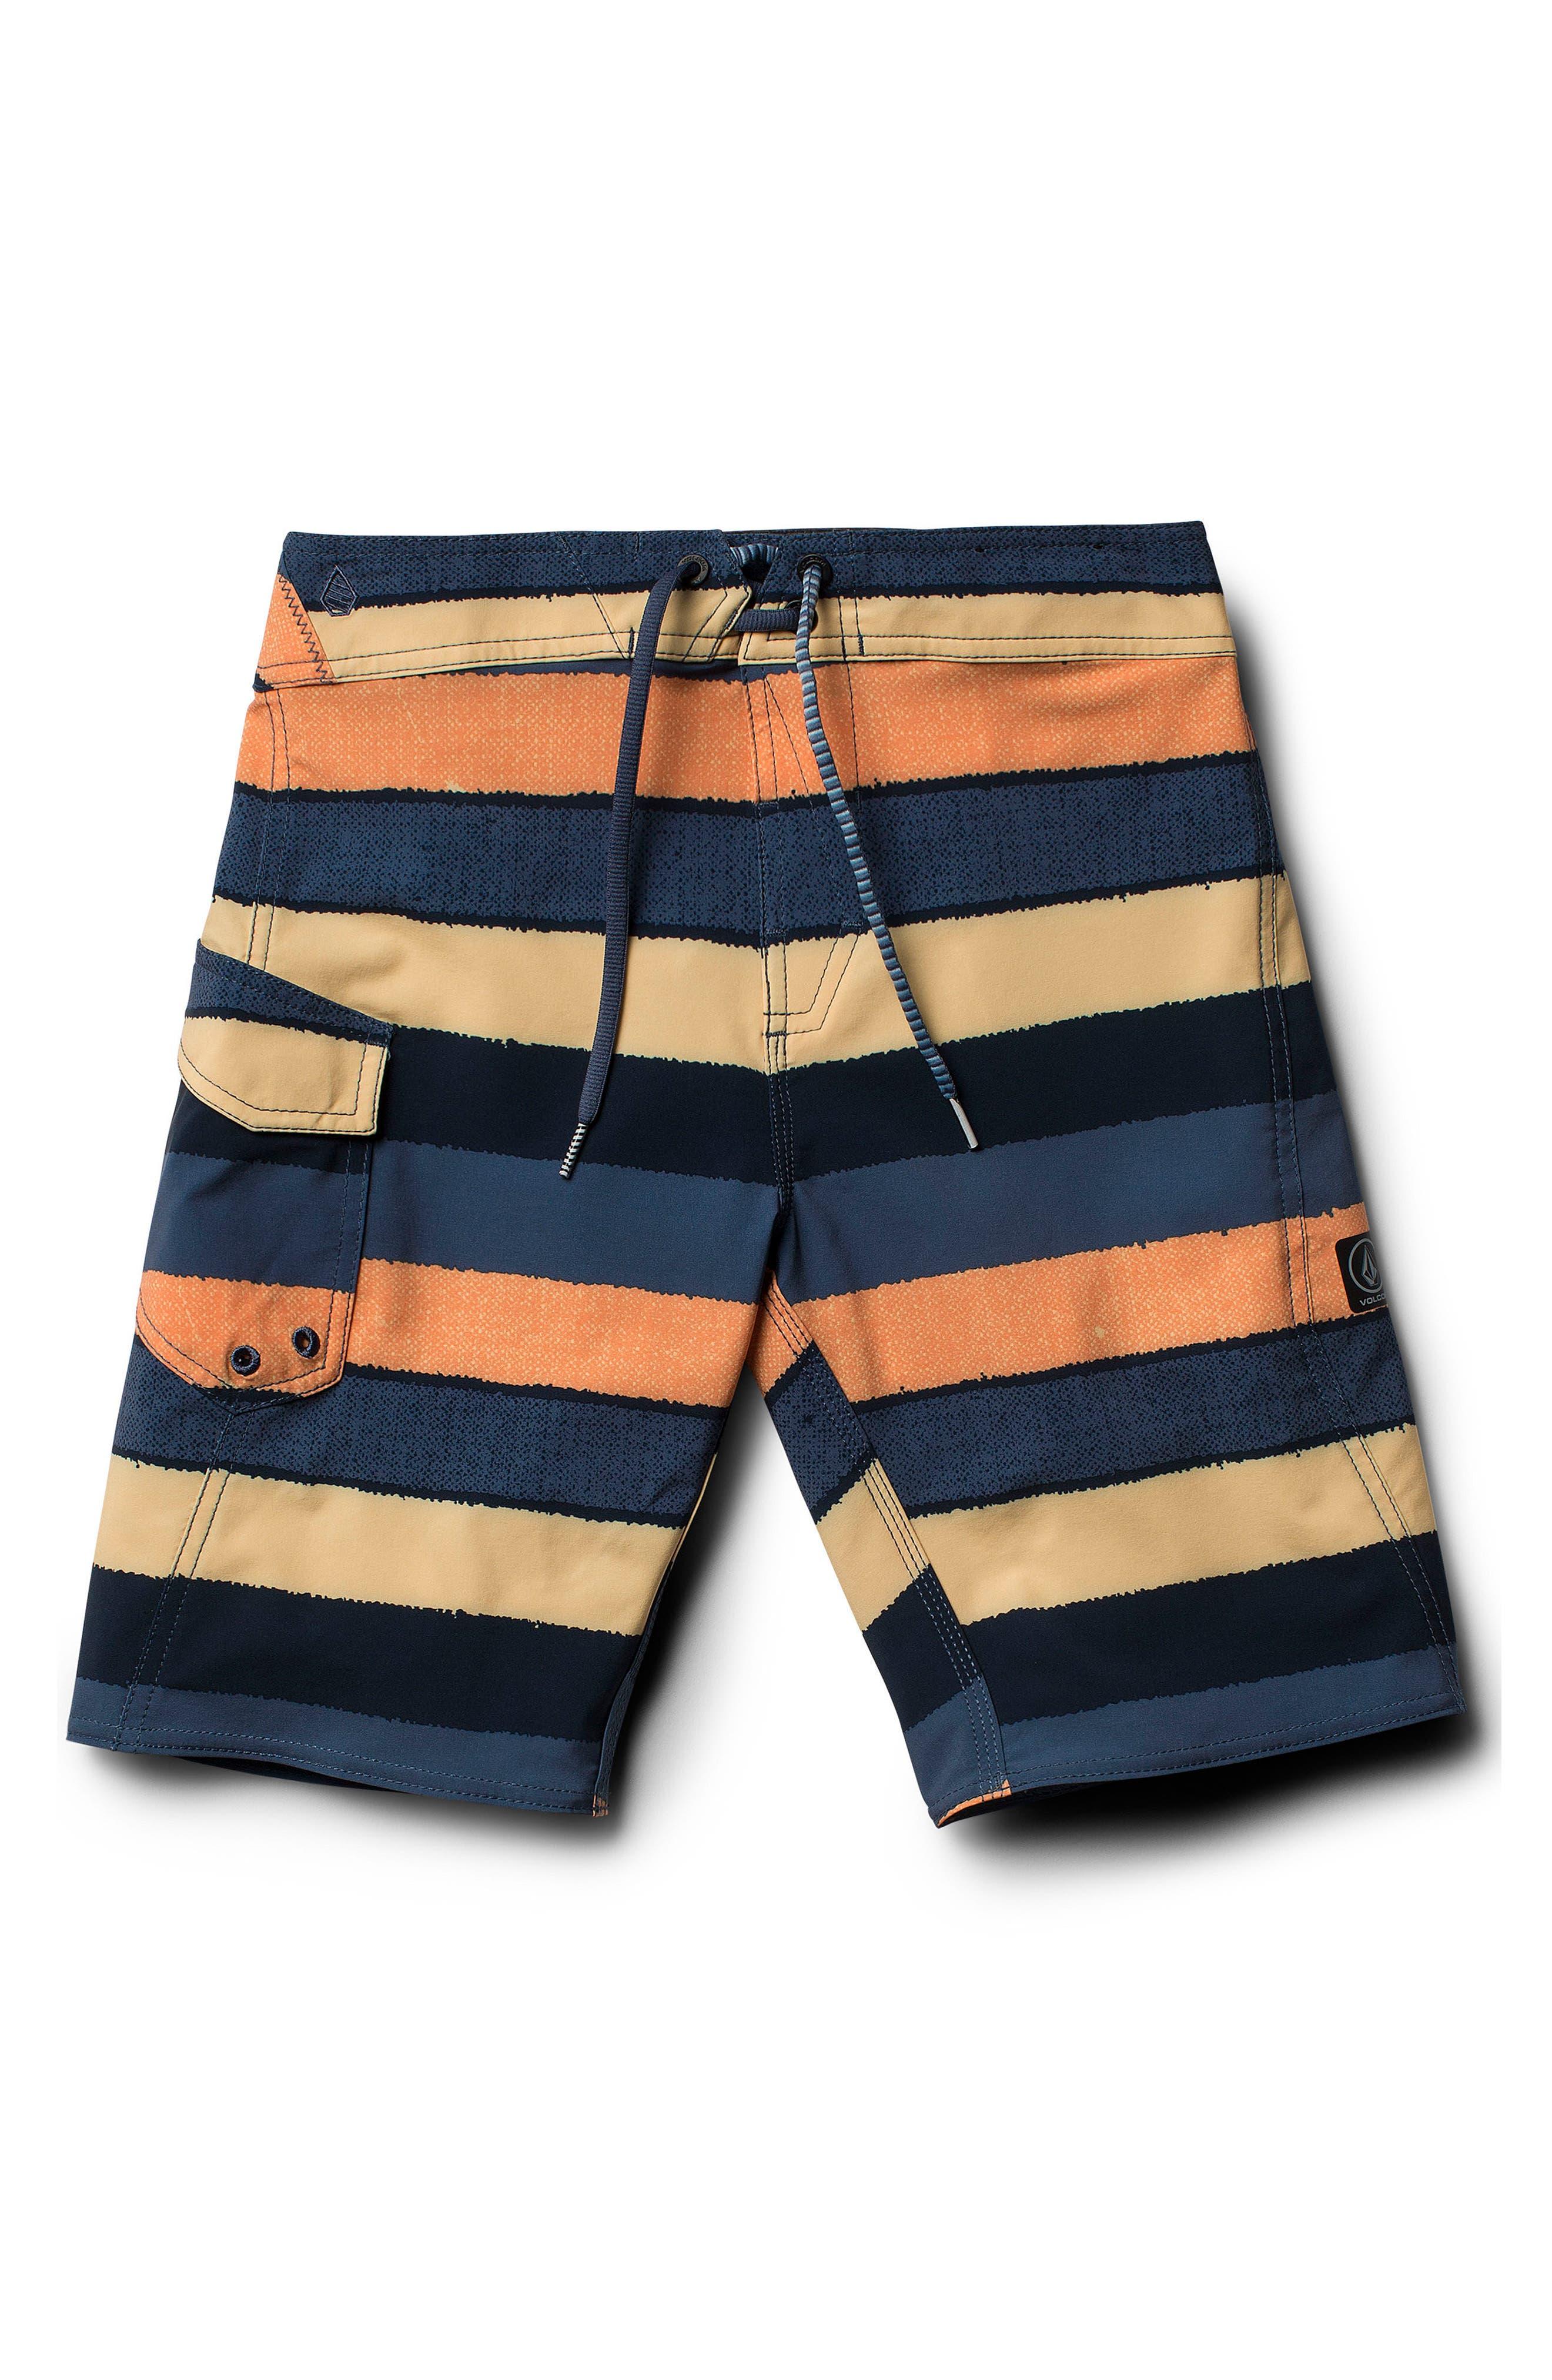 Magnetic Liney Mod Board Shorts,                             Main thumbnail 1, color,                             Sunburst